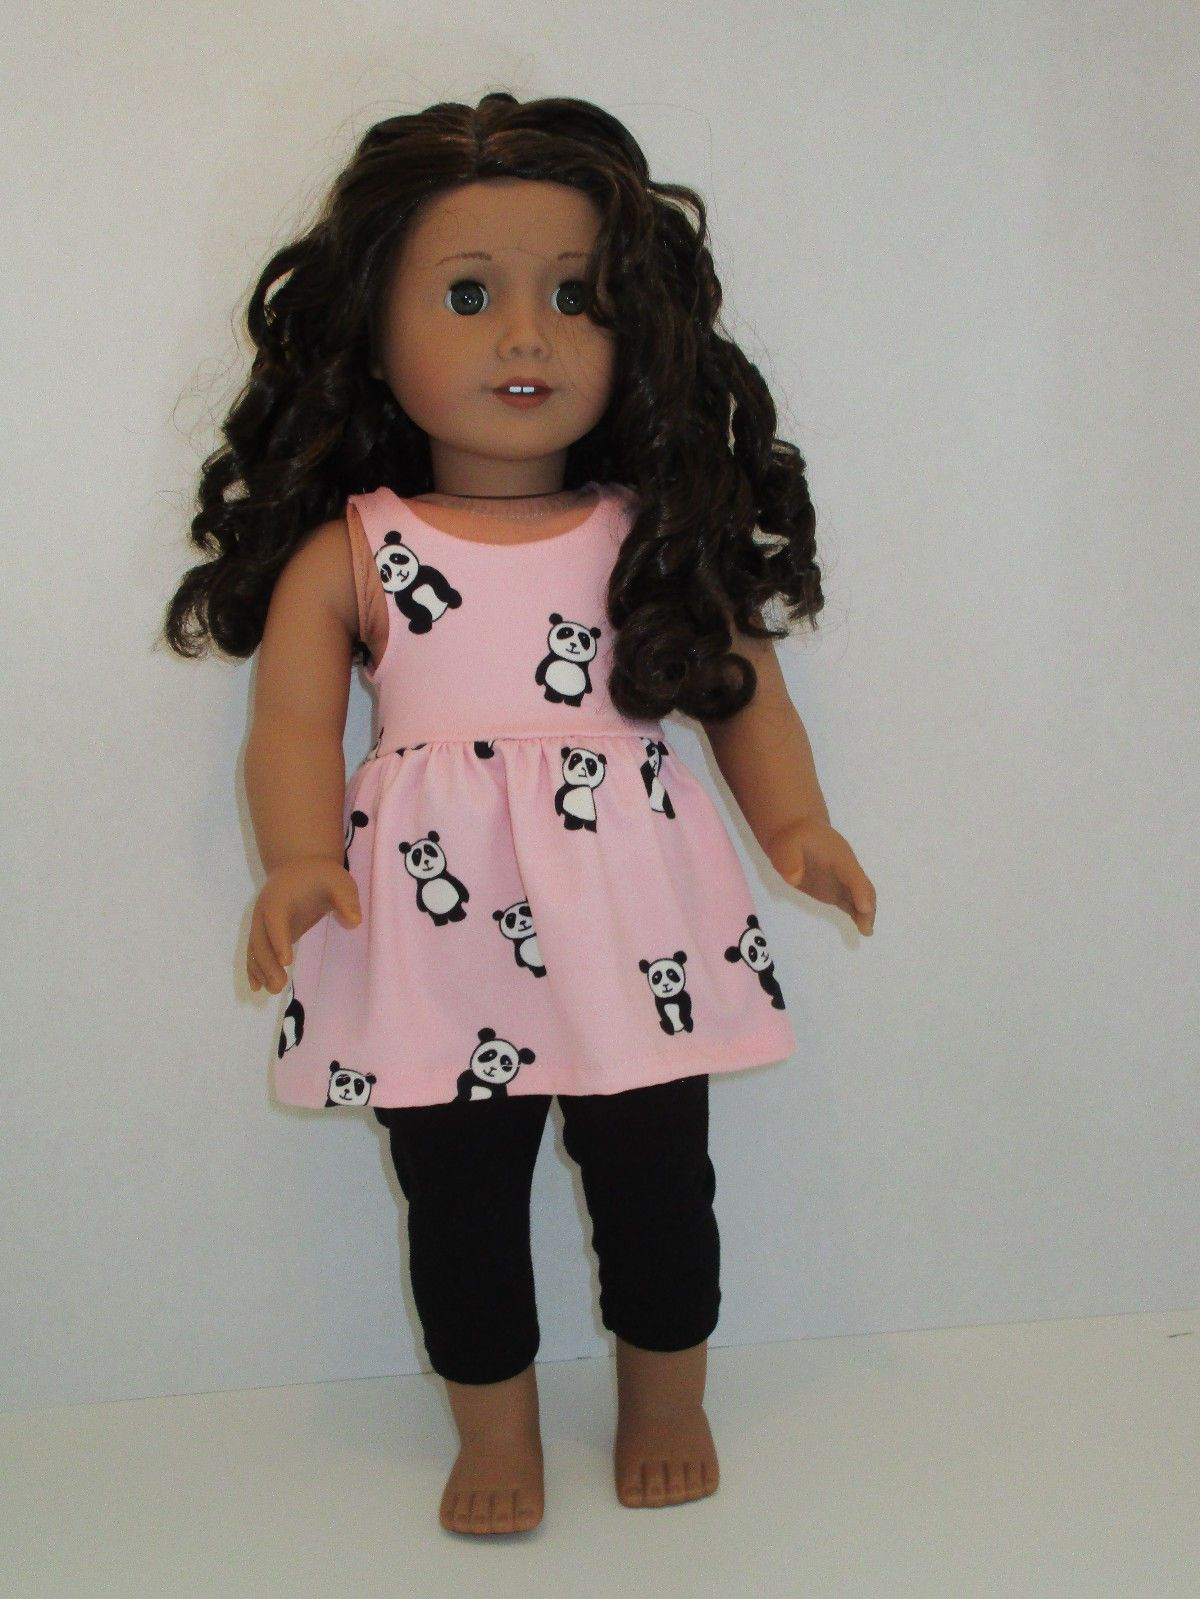 Doll Panda Pattern Sleepwear Outfit for 18/'/' AG American Doll Dolls